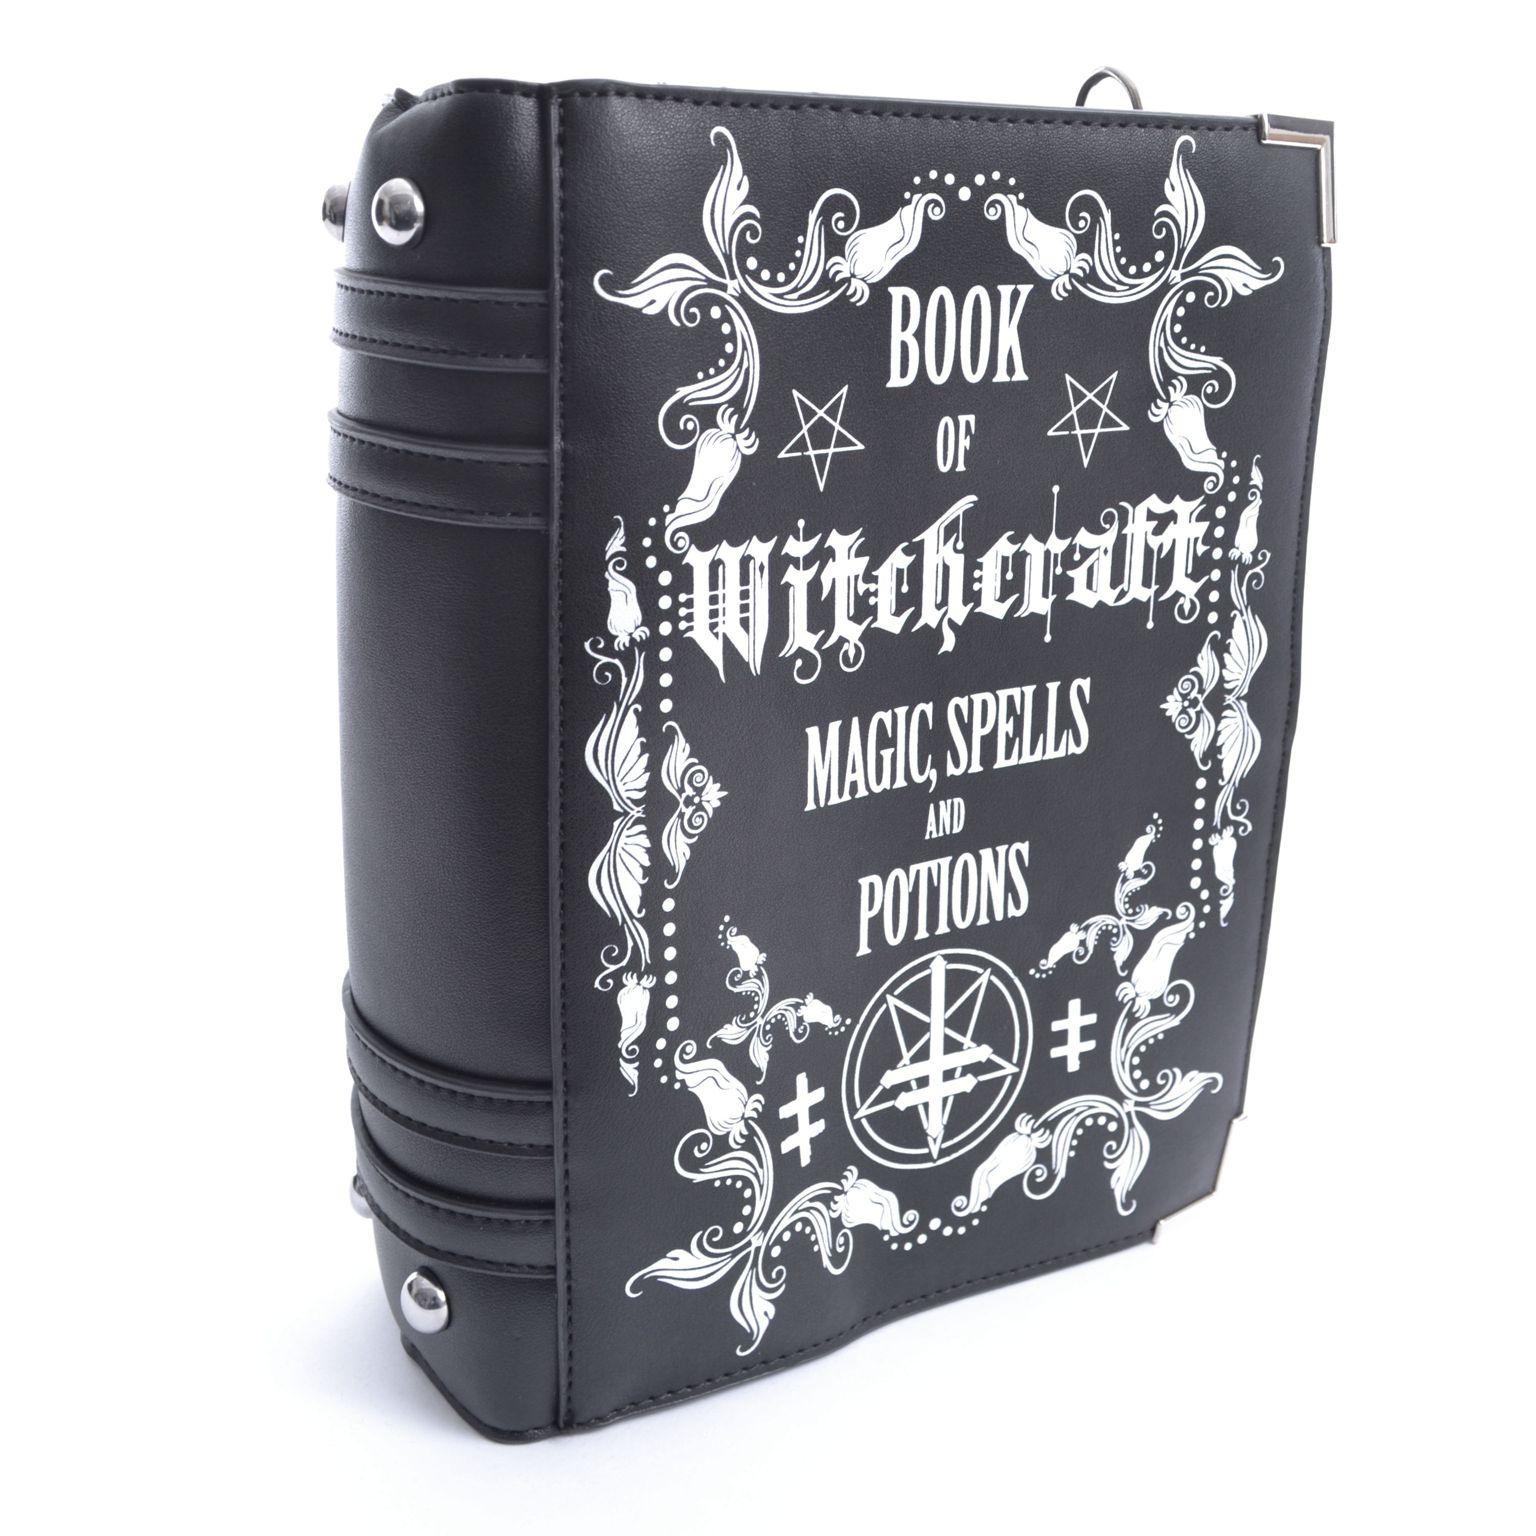 SPBA001_sac-a-main-gothique-glam-rock-livre-witchcraft